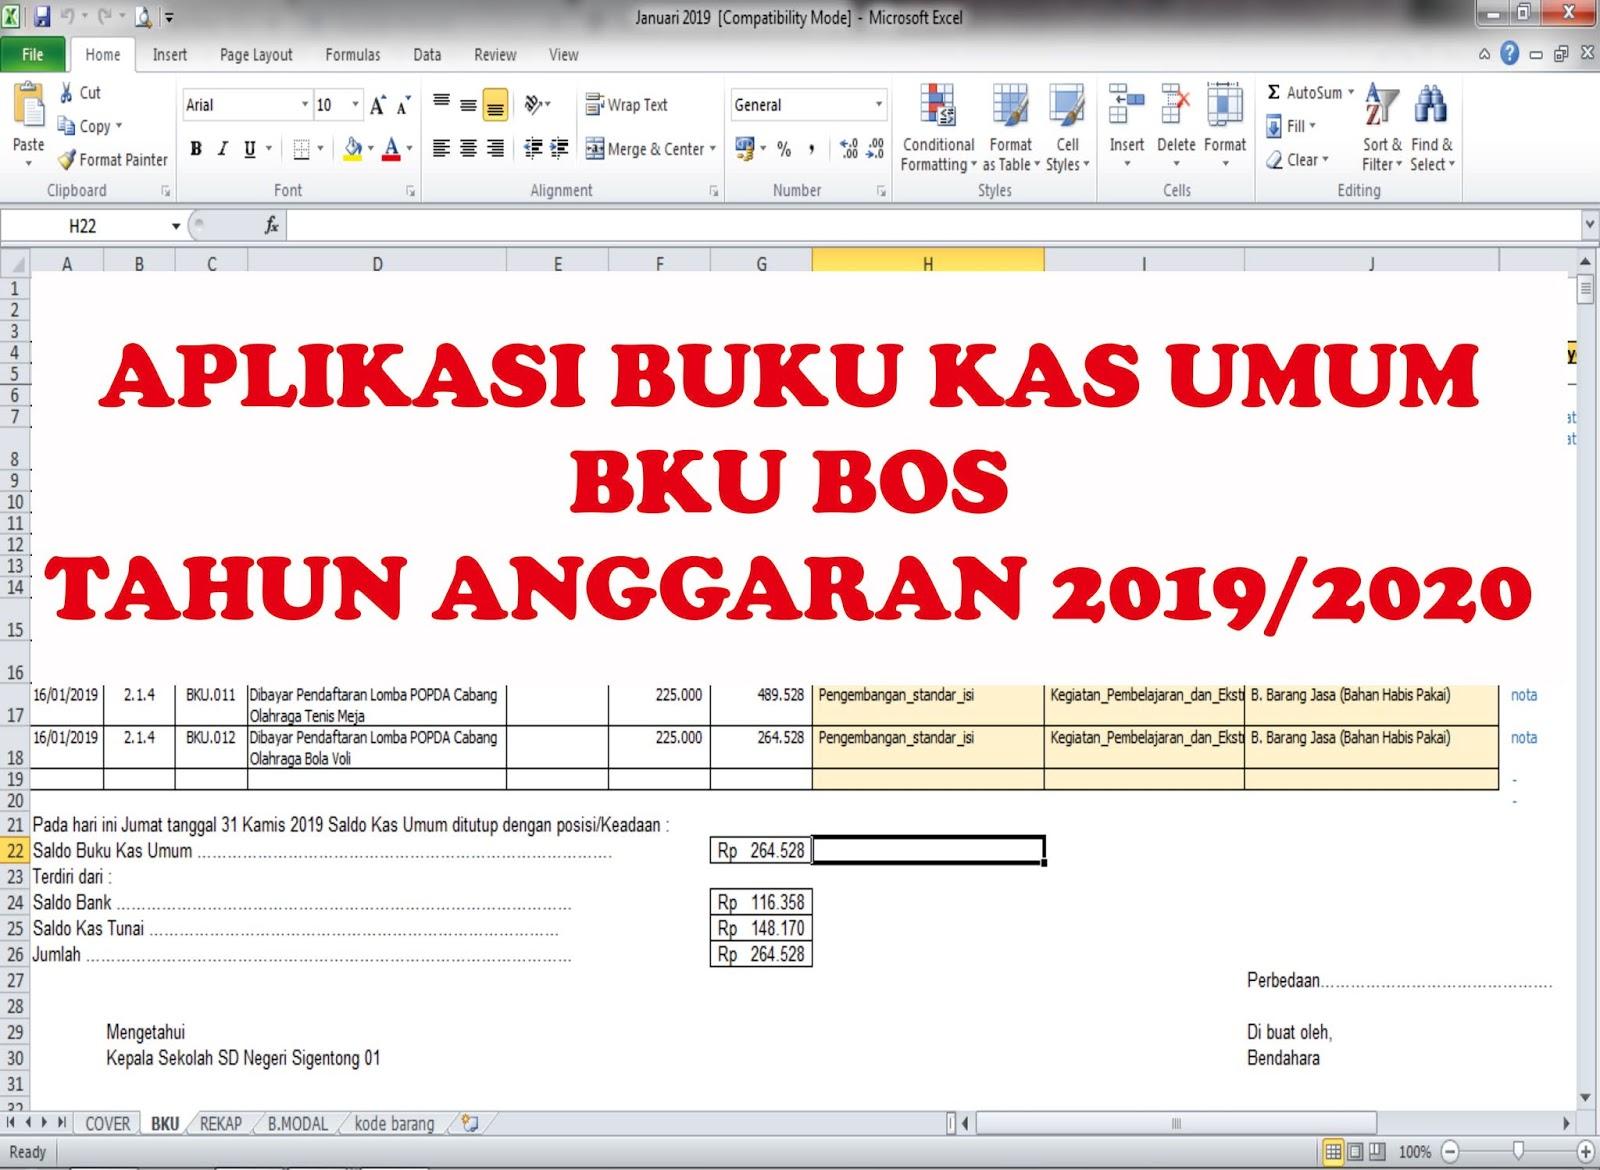 Aplikasi Buku Kas Umum Bku Bos Terbaru Tahun Anggaran 2019